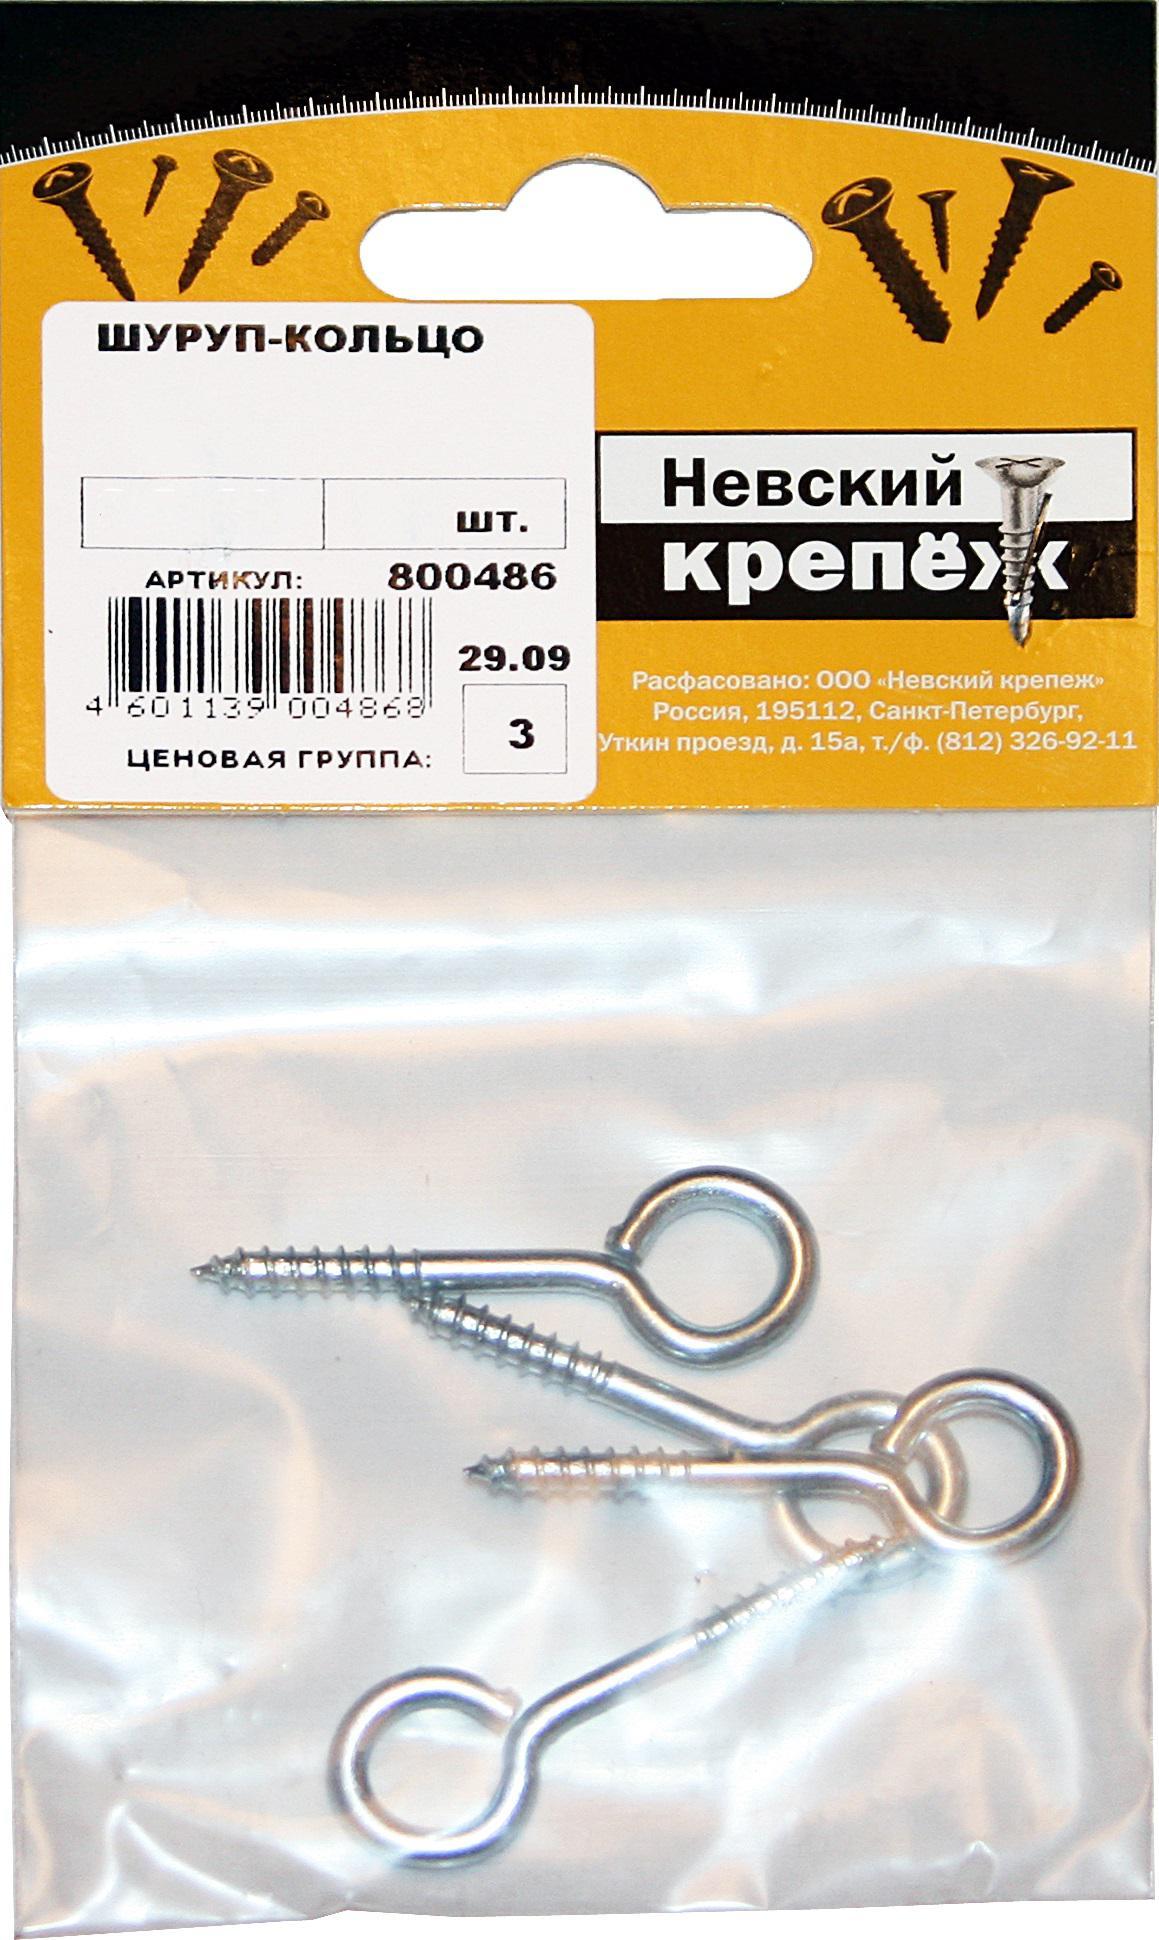 Шуруп-кольцо НЕВСКИЙ КРЕПЕЖ 800486